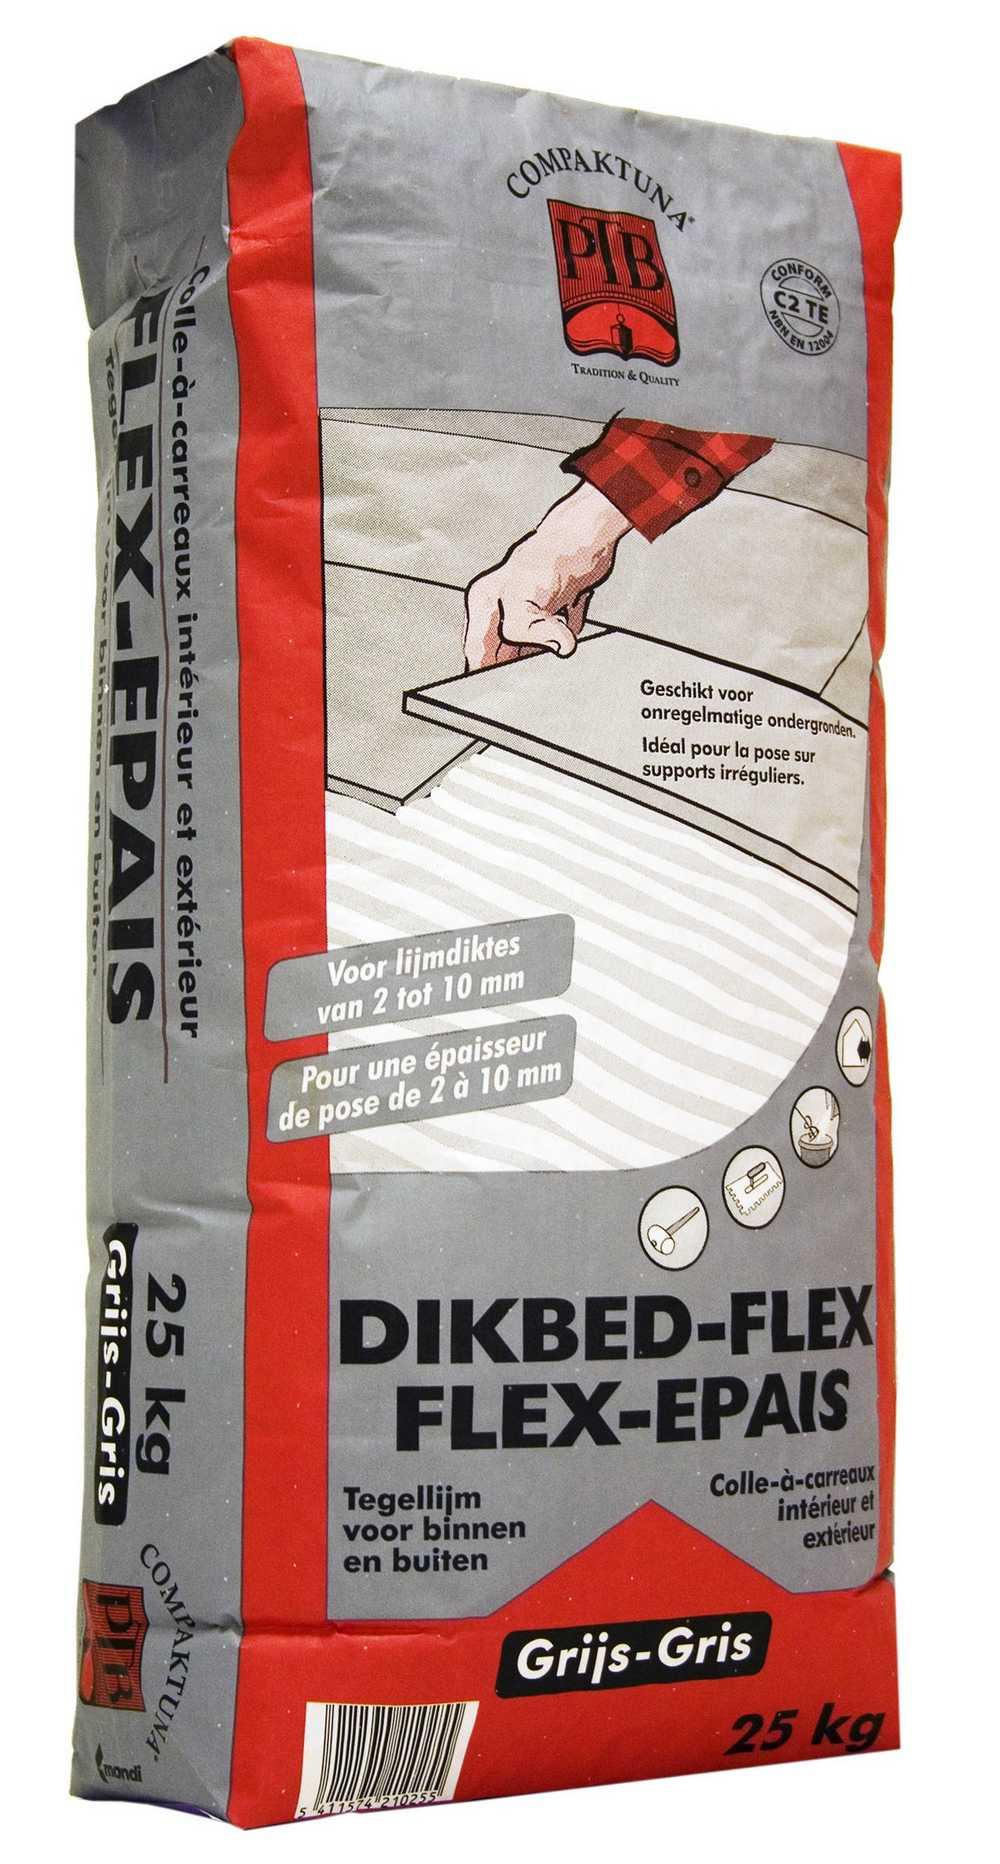 Dikbed-flex - 25kg - Grijs